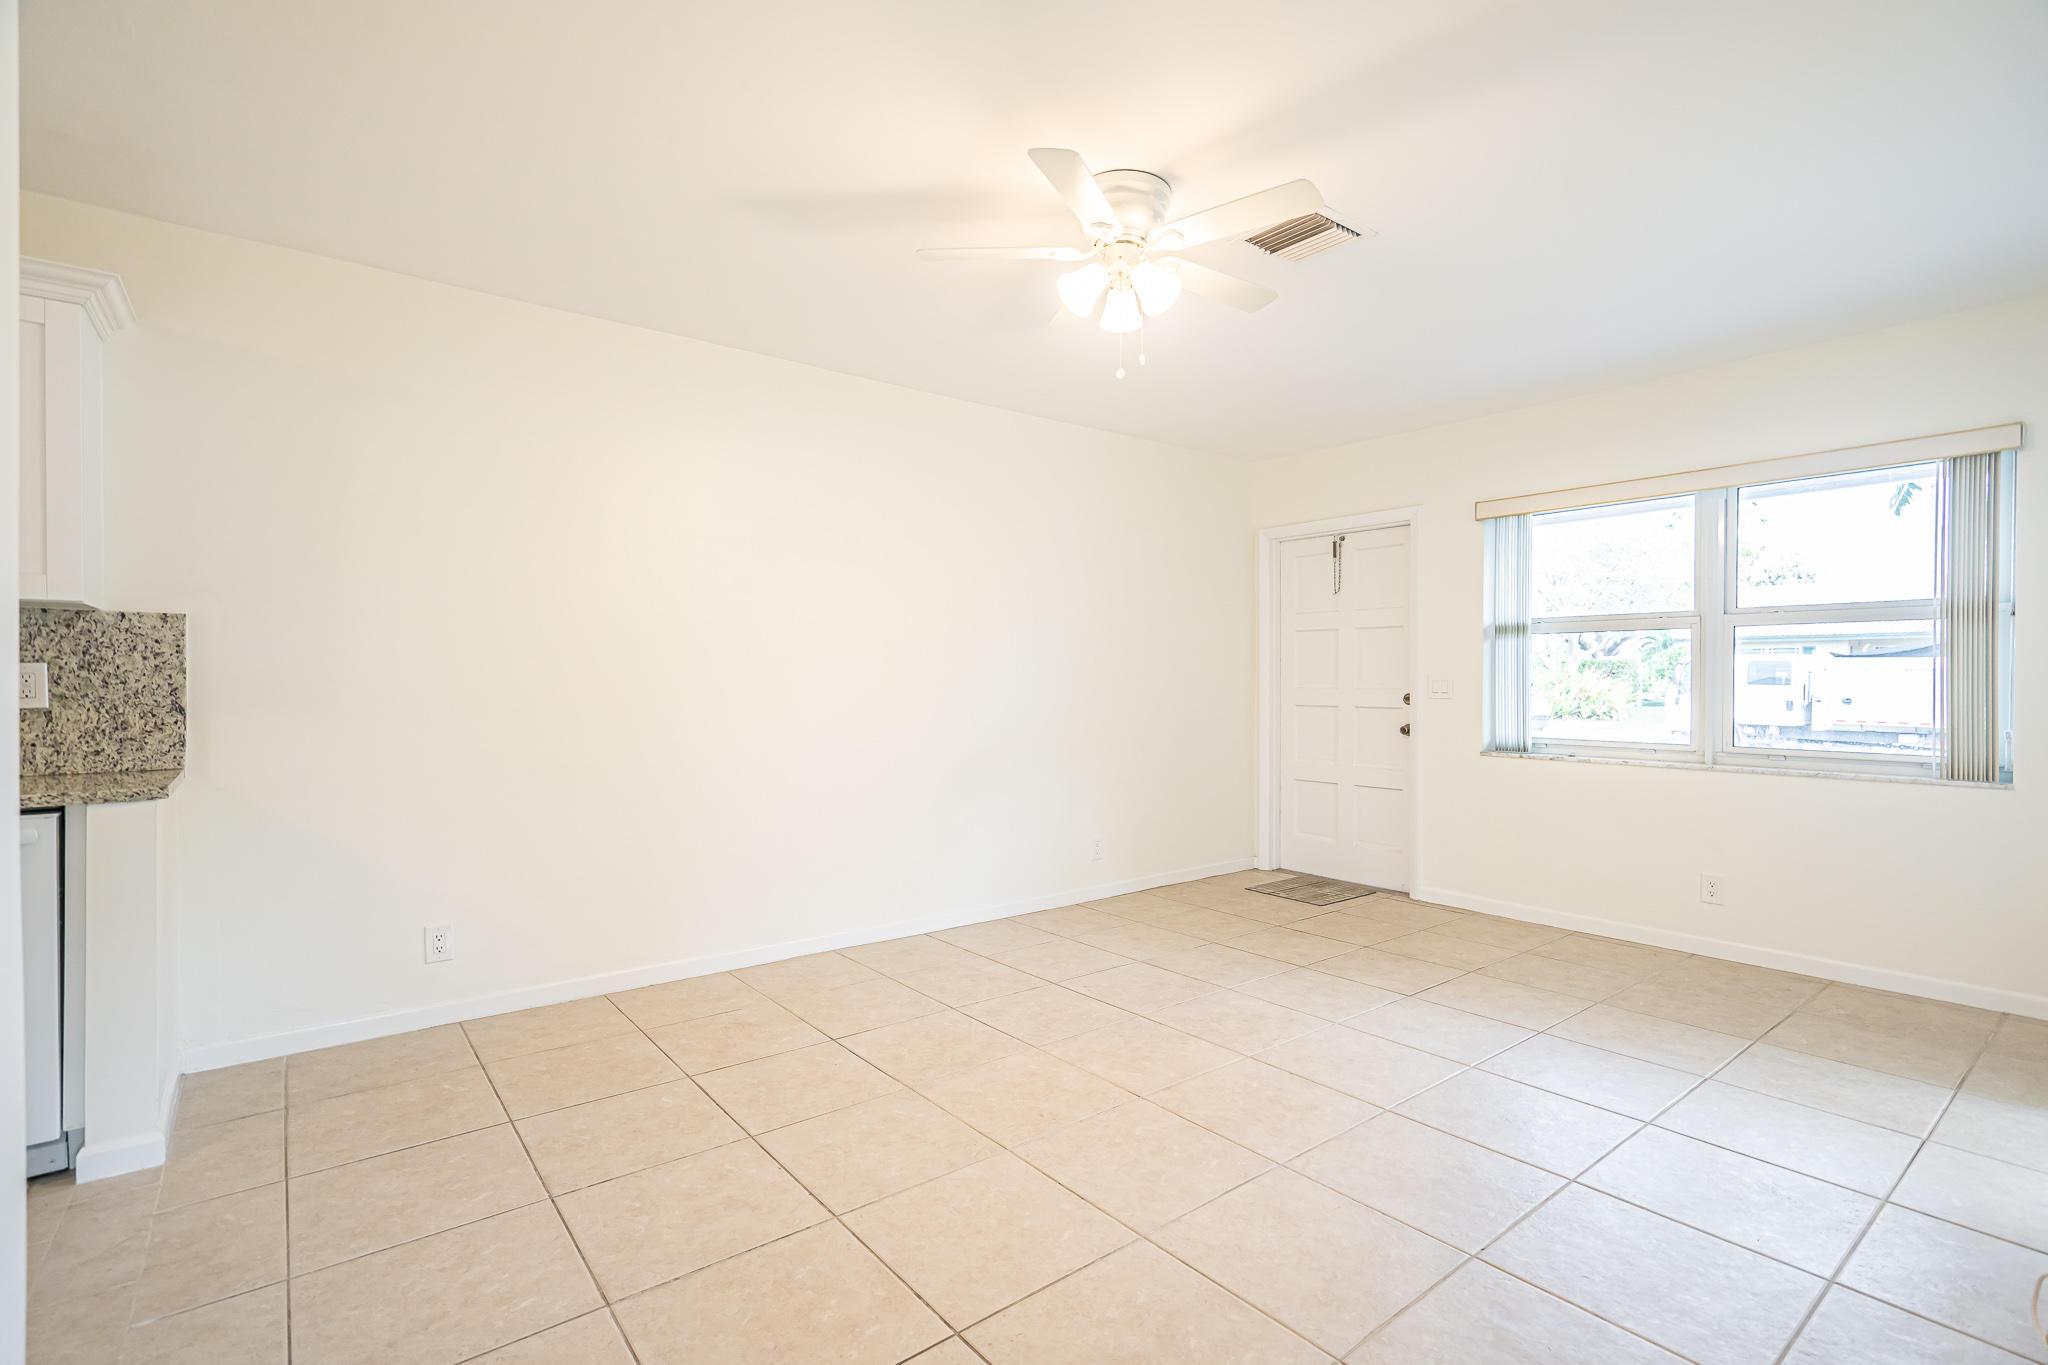 502 Living Room